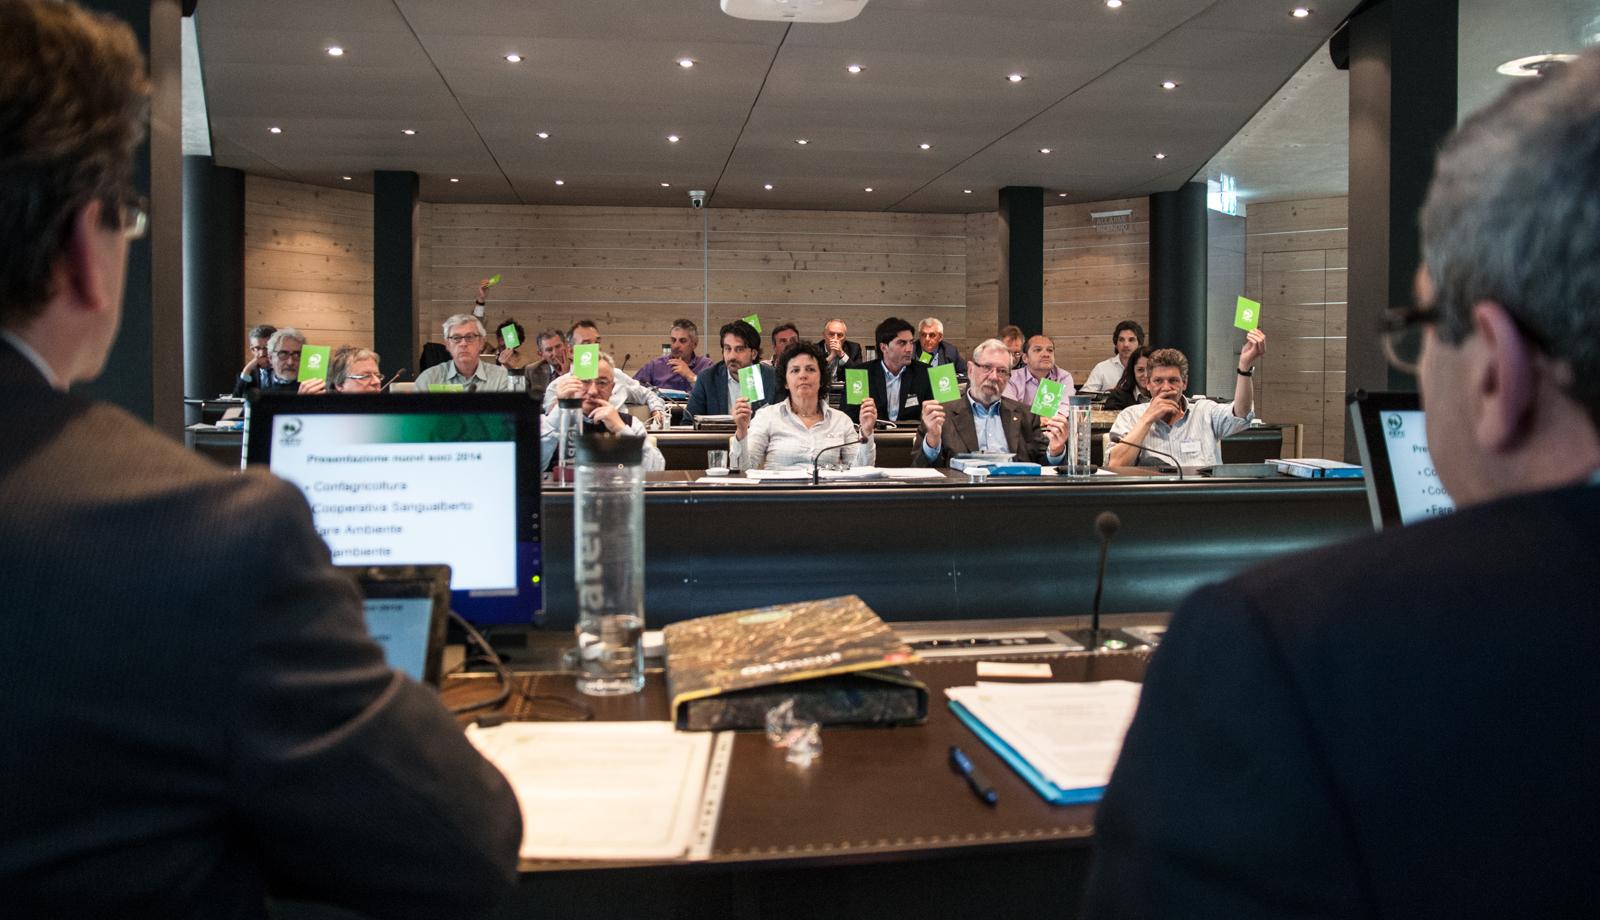 Assemblea dei soci PEFC – Le foto online